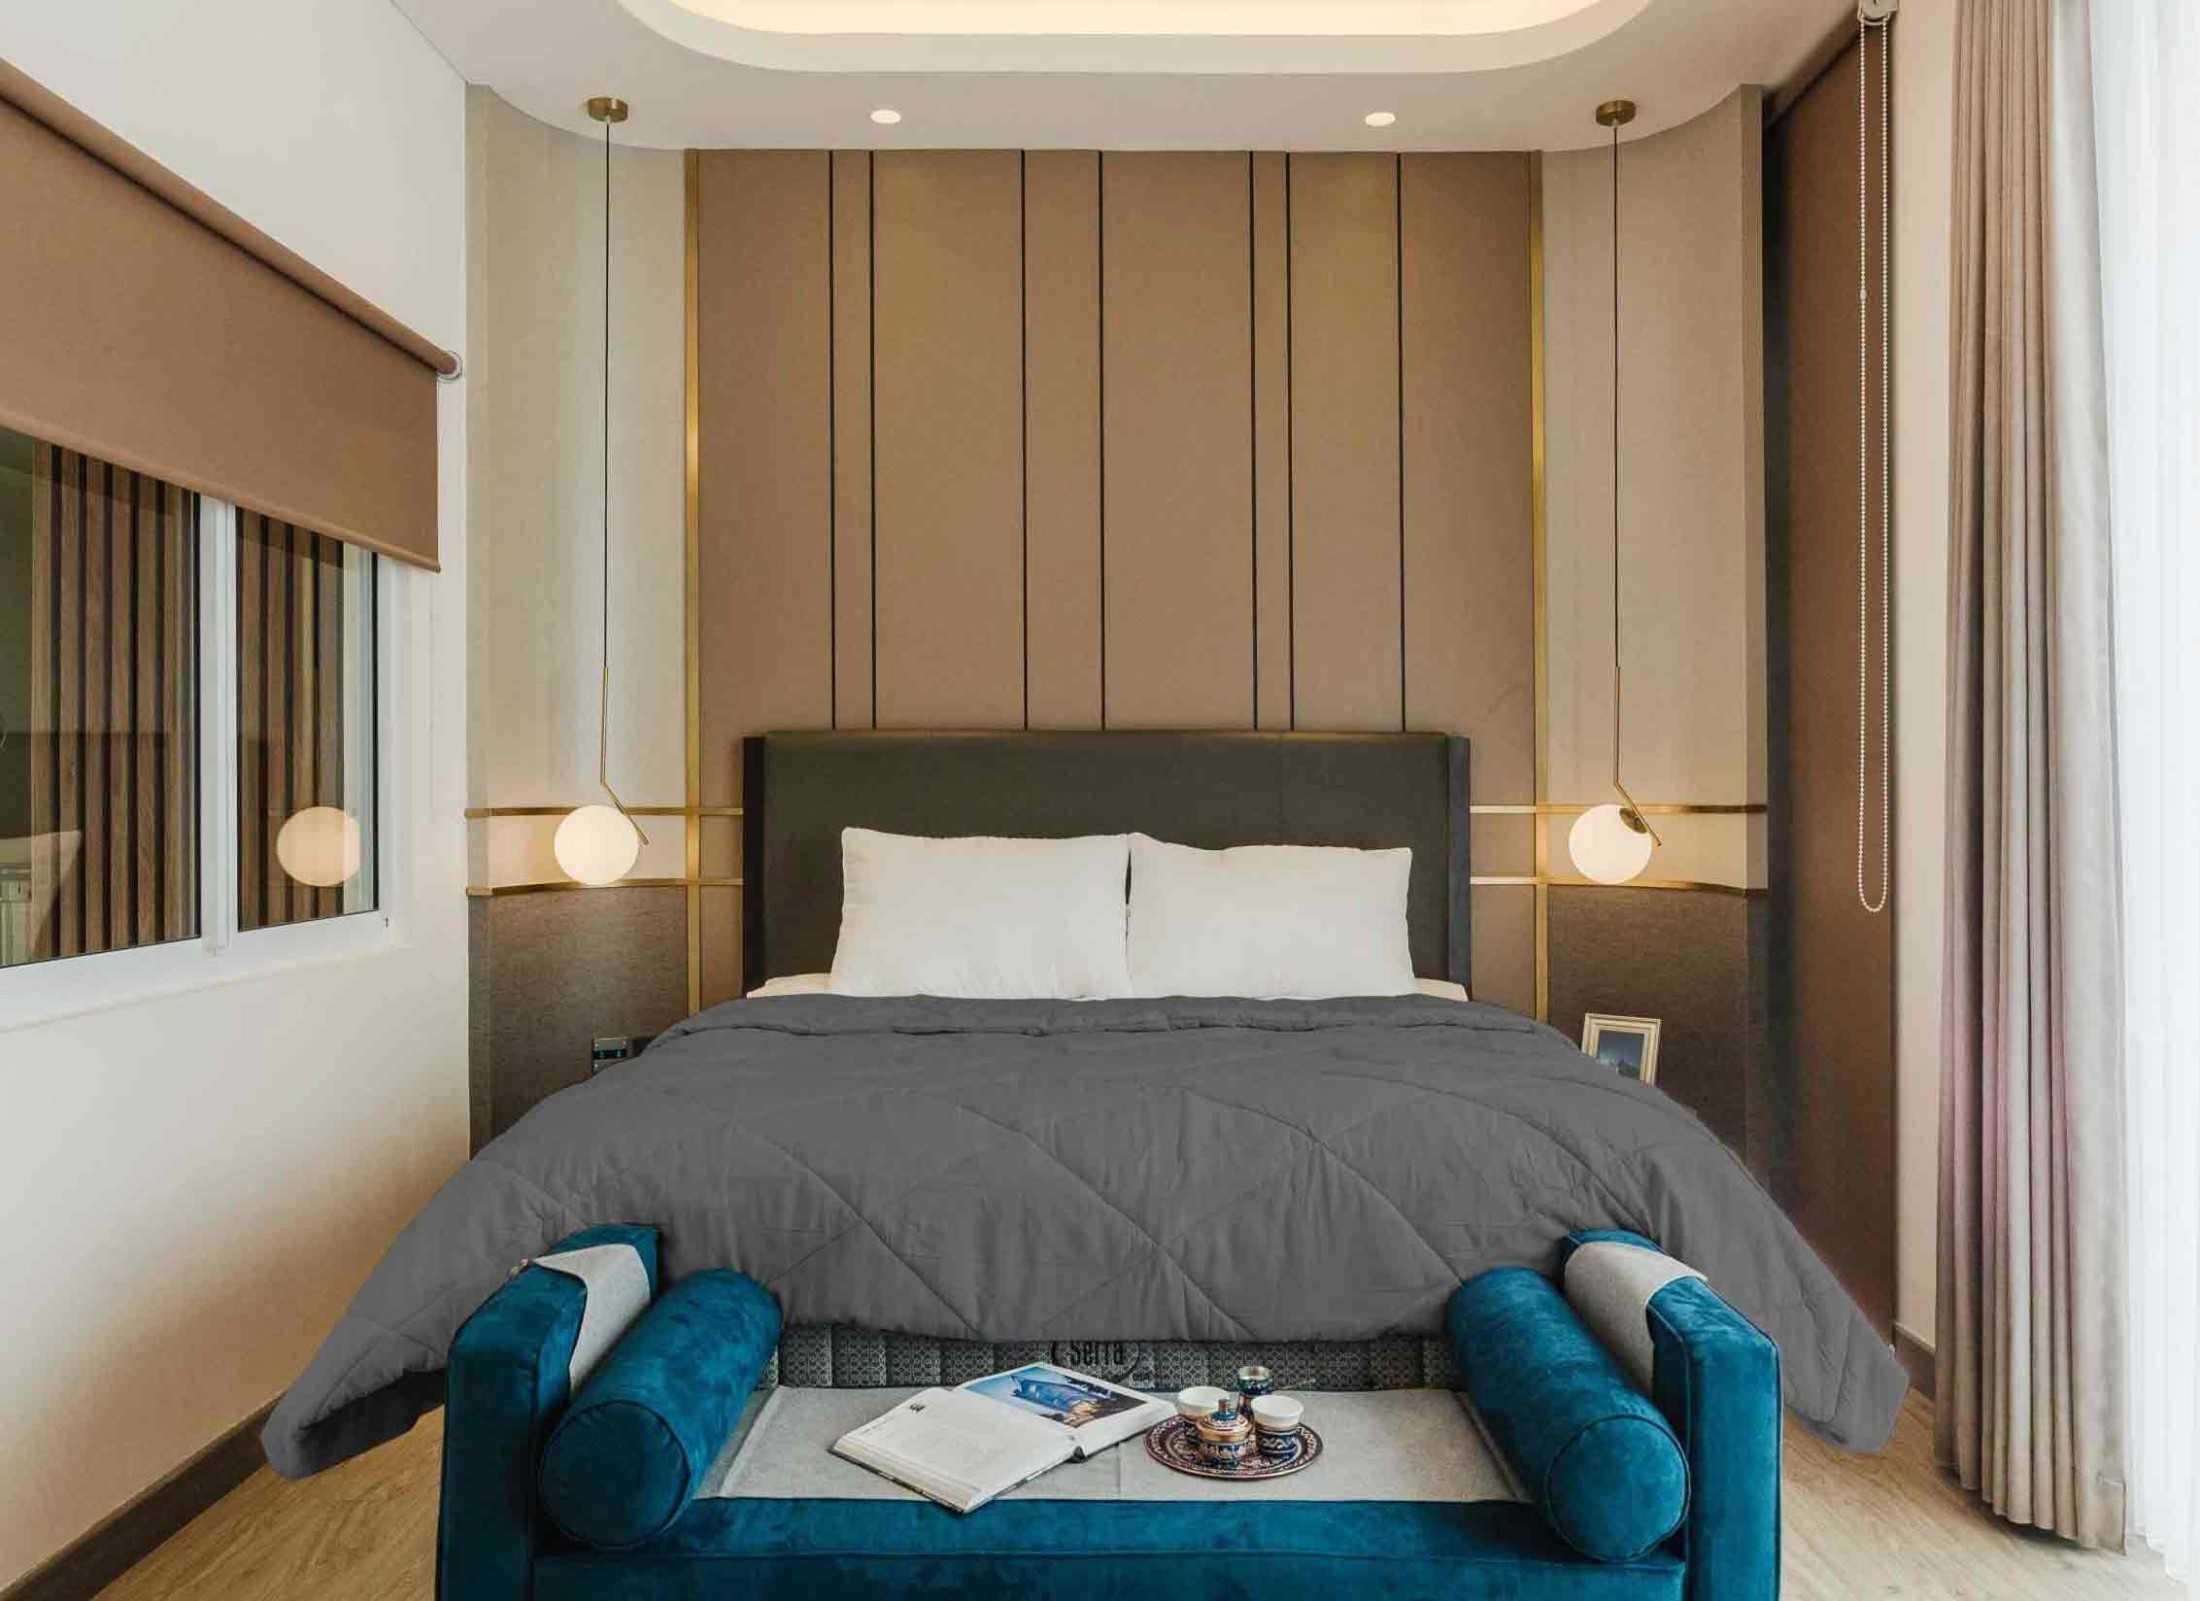 Ide Lampu Kamar Tidur Cantik yang Bikin Nyaman   Foto artikel Arsitag